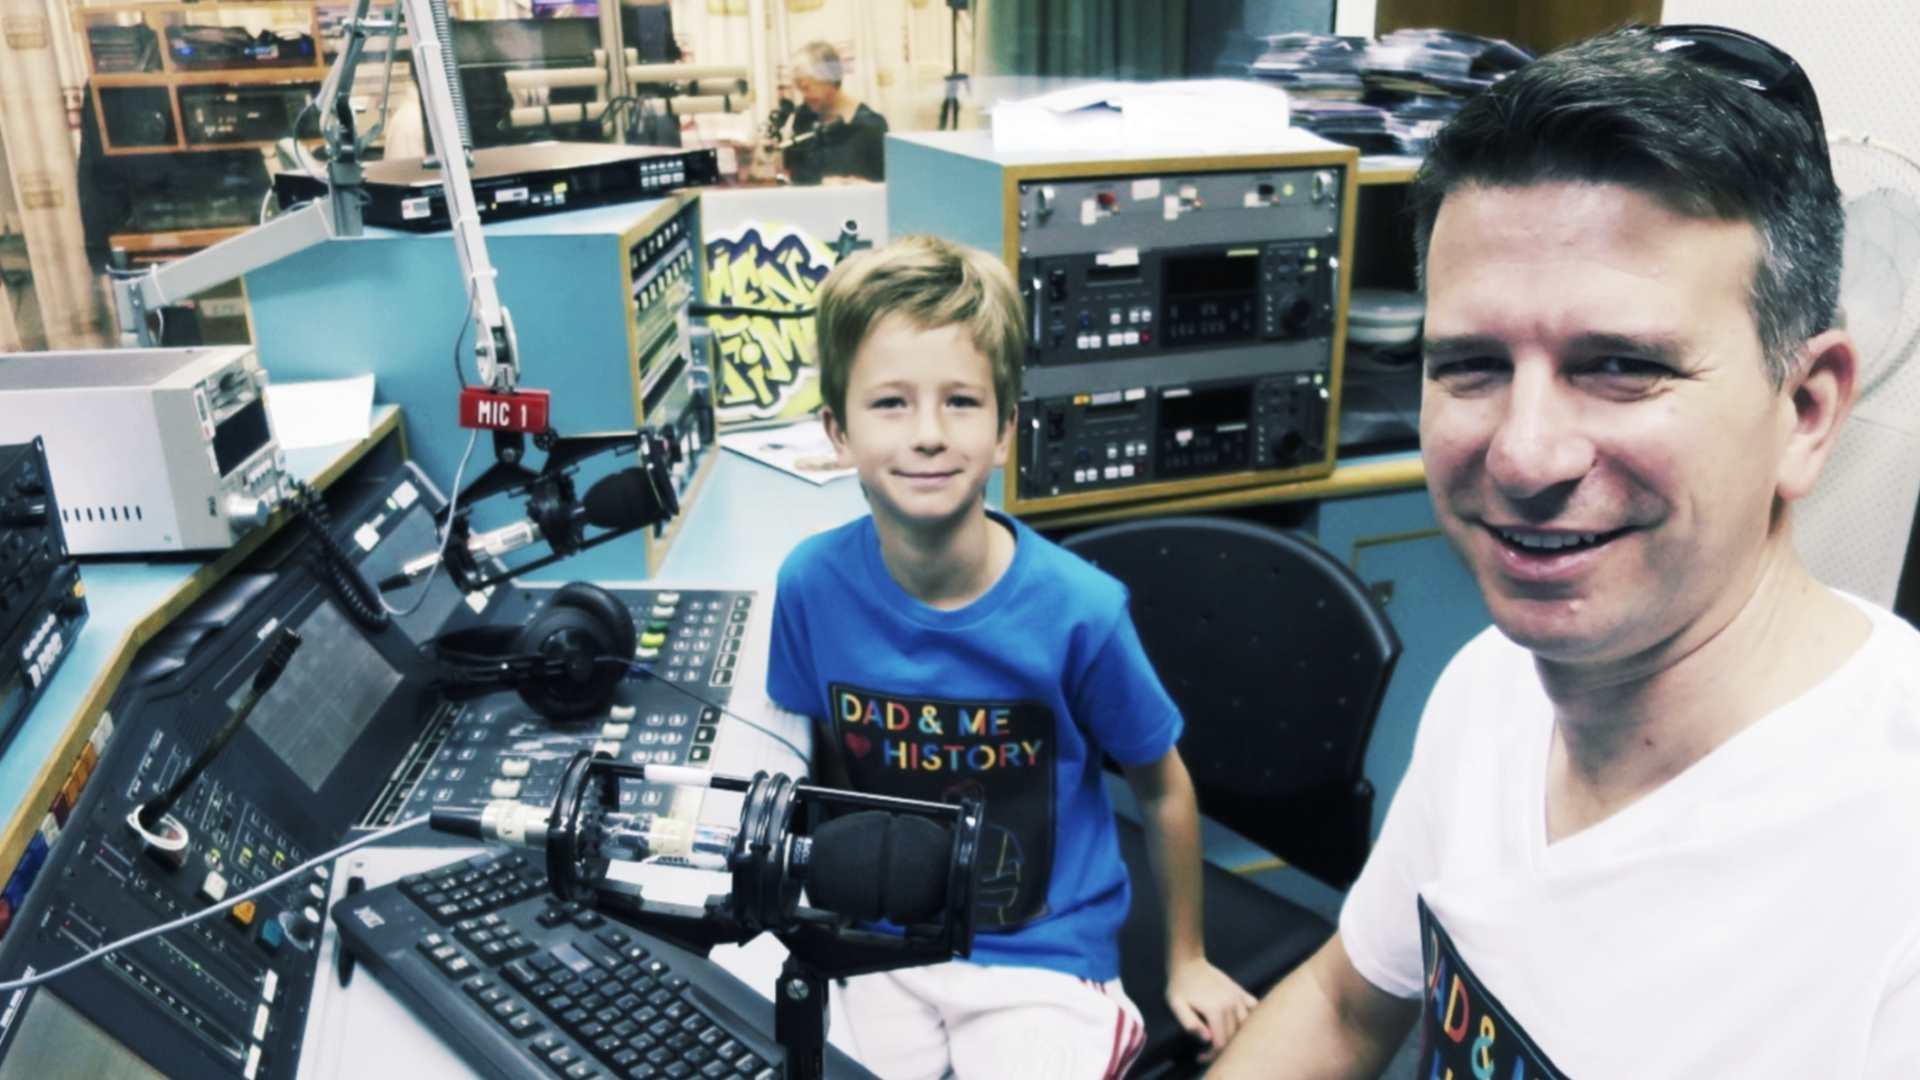 Dad & Me Love History kids podcast